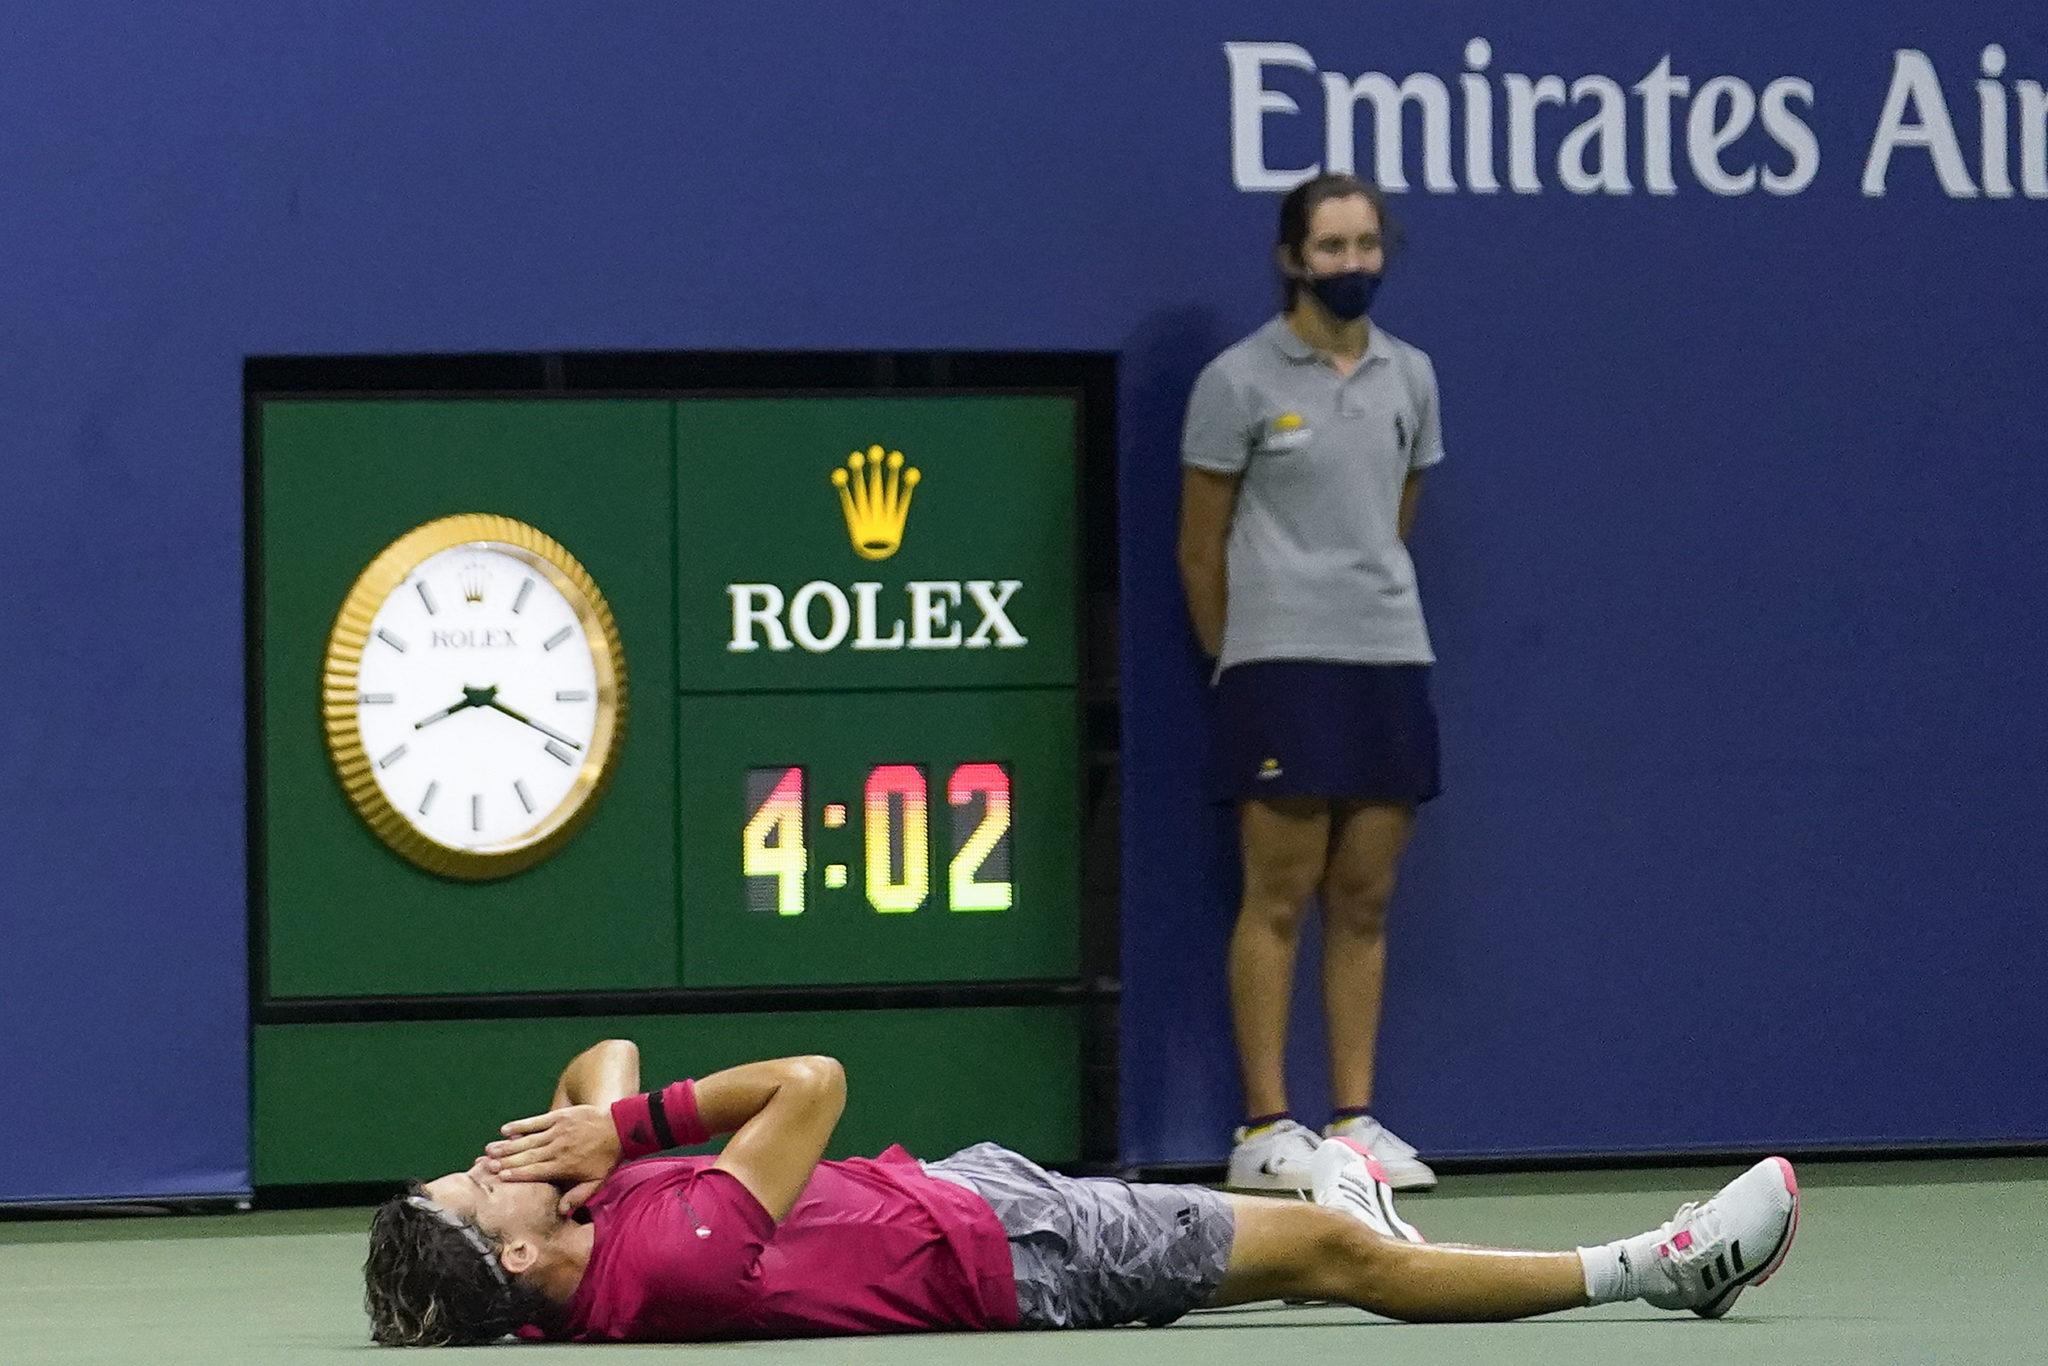 Dominic Thiem breaks down following his victory over Alexander Zverev